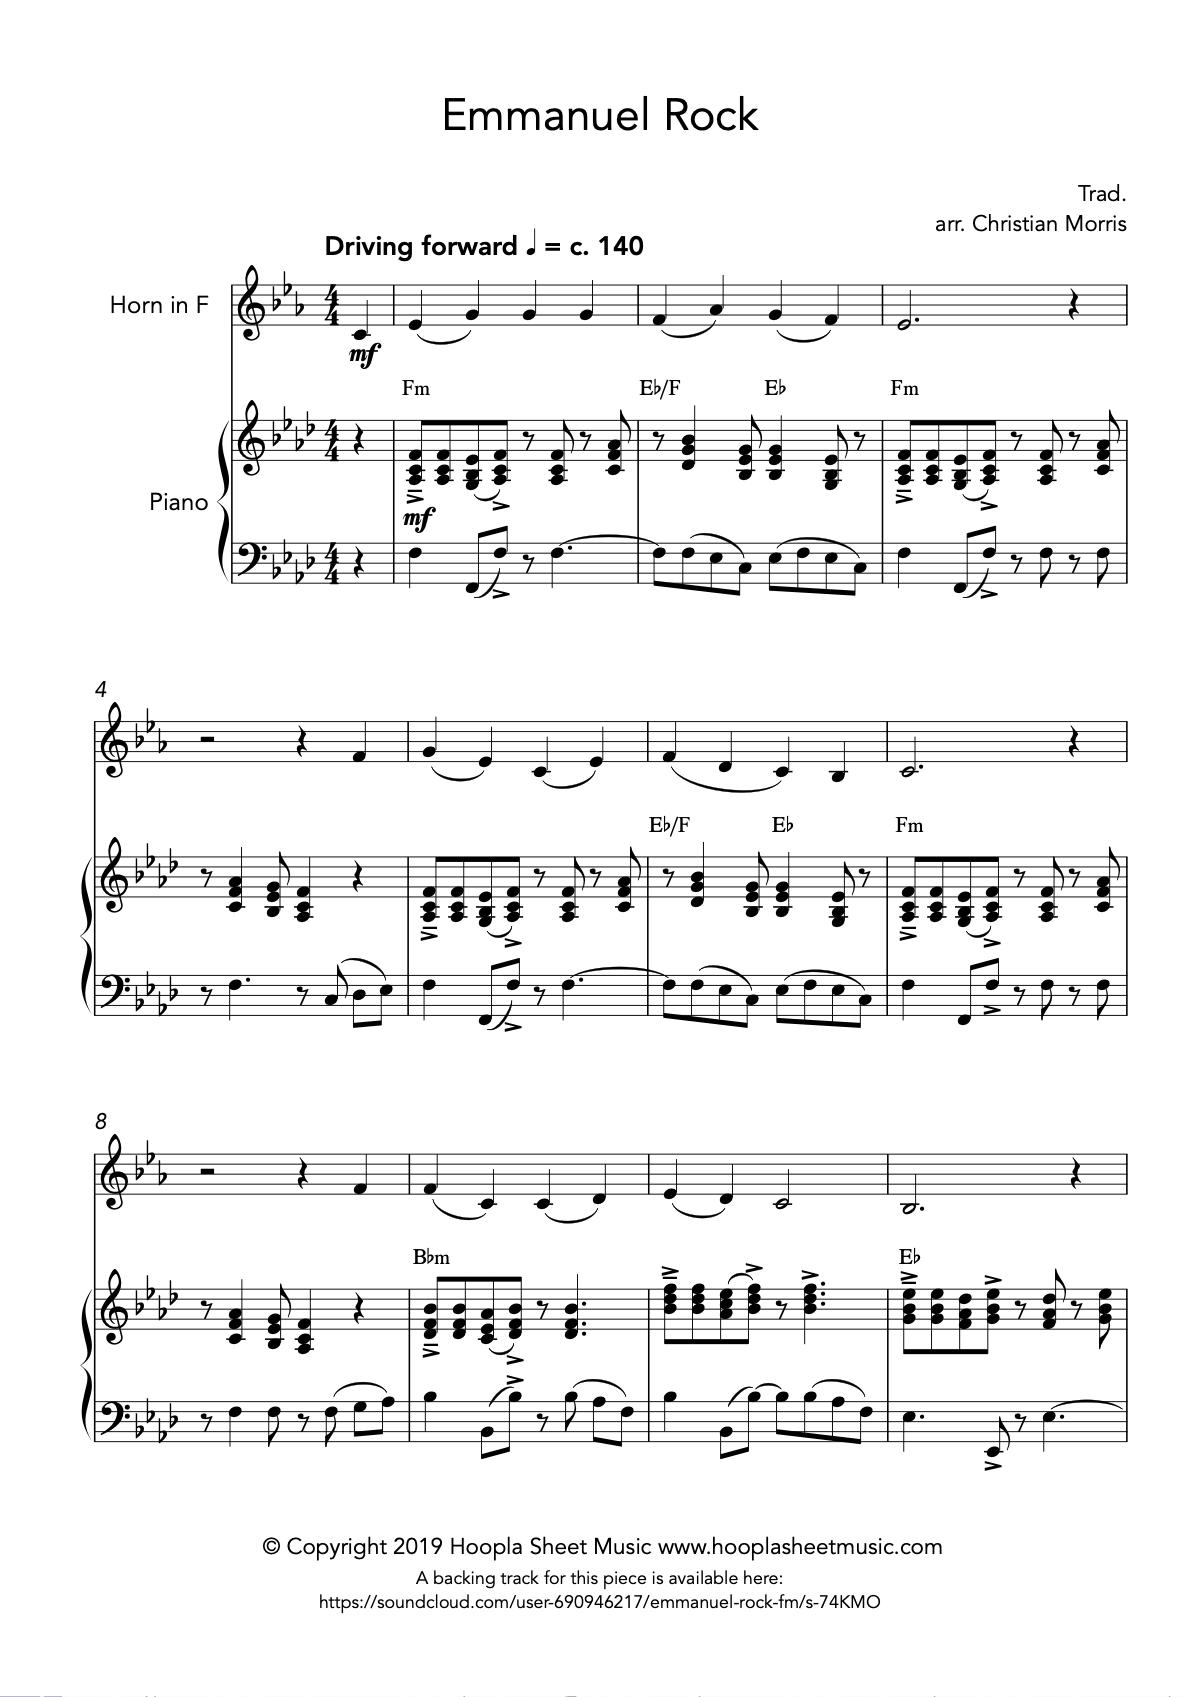 Emmanuel Rock (O Come, O Come Emmanuel) for French Horn